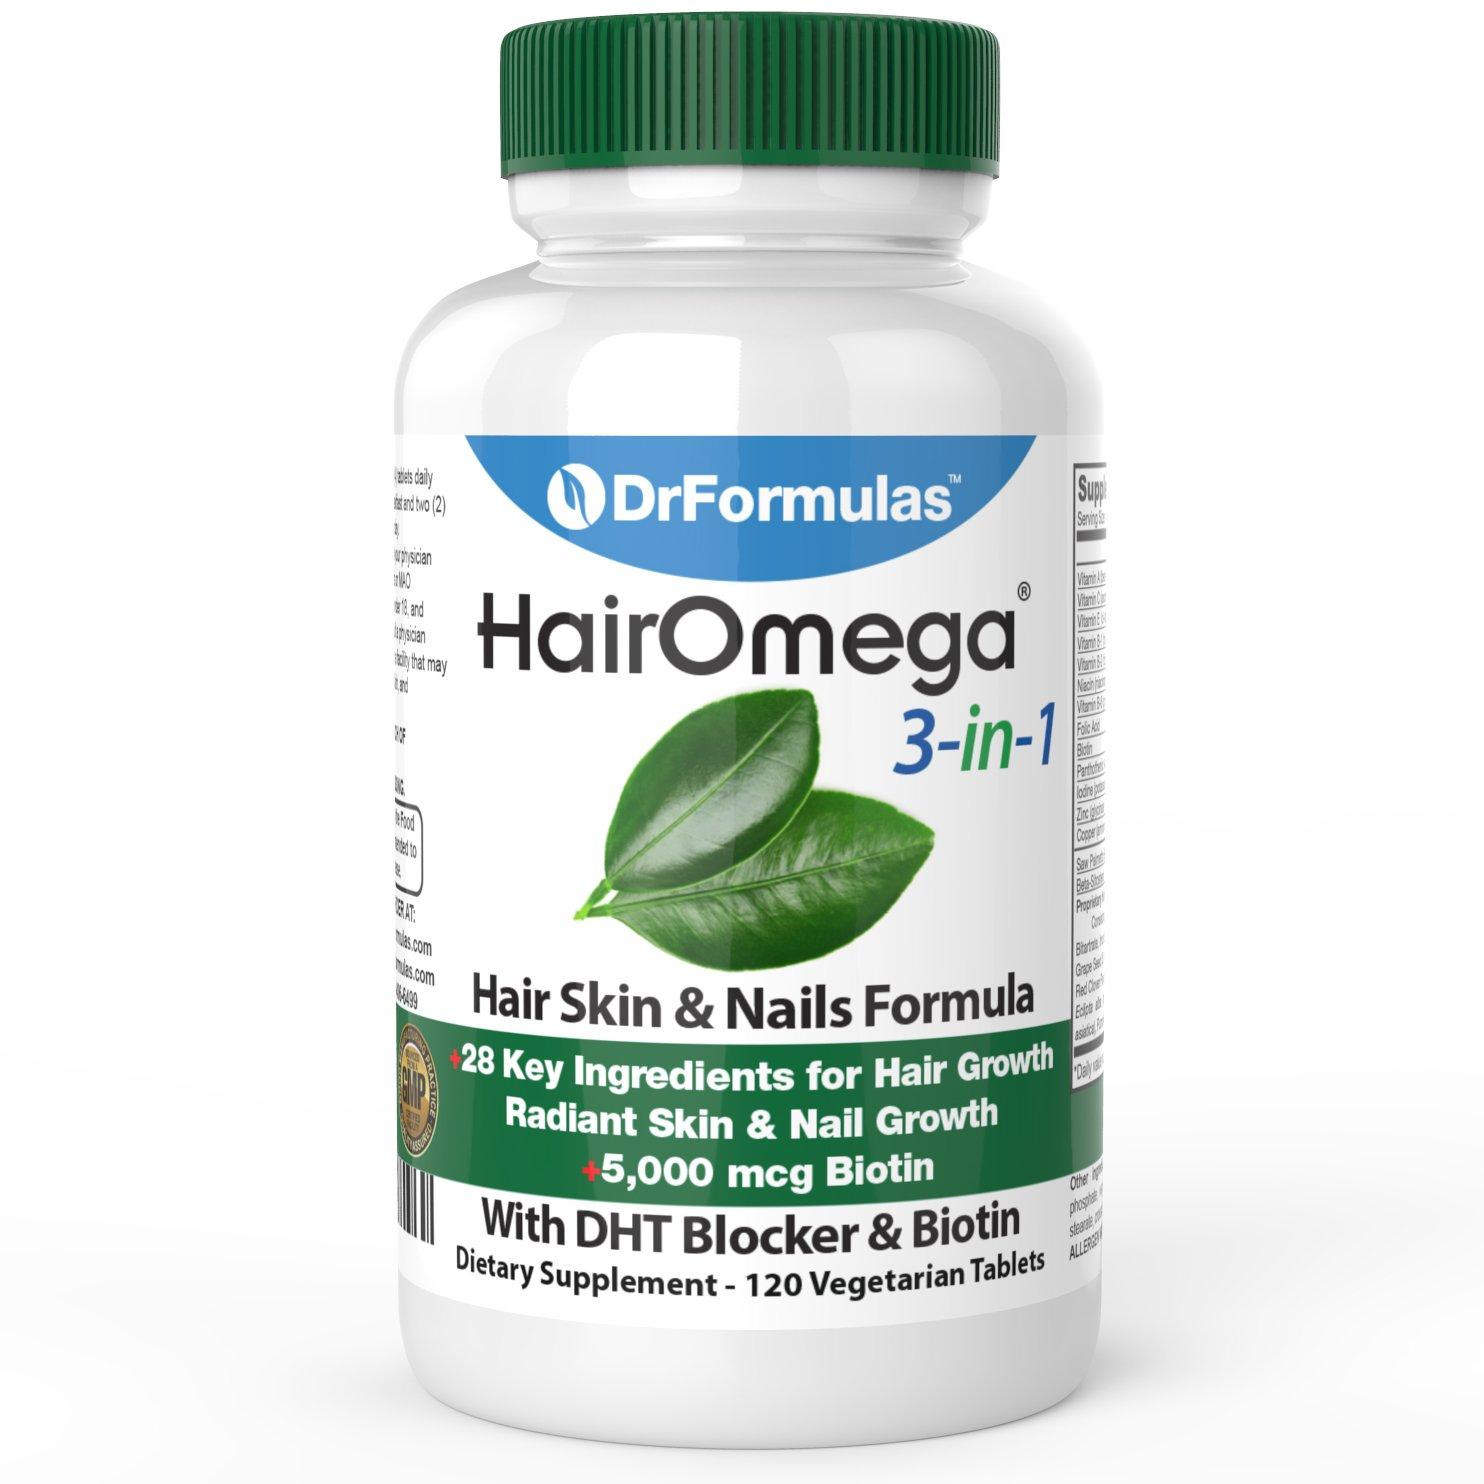 DrFormulas HairOmega 3-in-1 Hair Growth Vitamins with DHT Blocker, Biotin for Women & Men | Hair Skin and Nails Supplement for Hair Loss, 120 Pills by DrFormulas